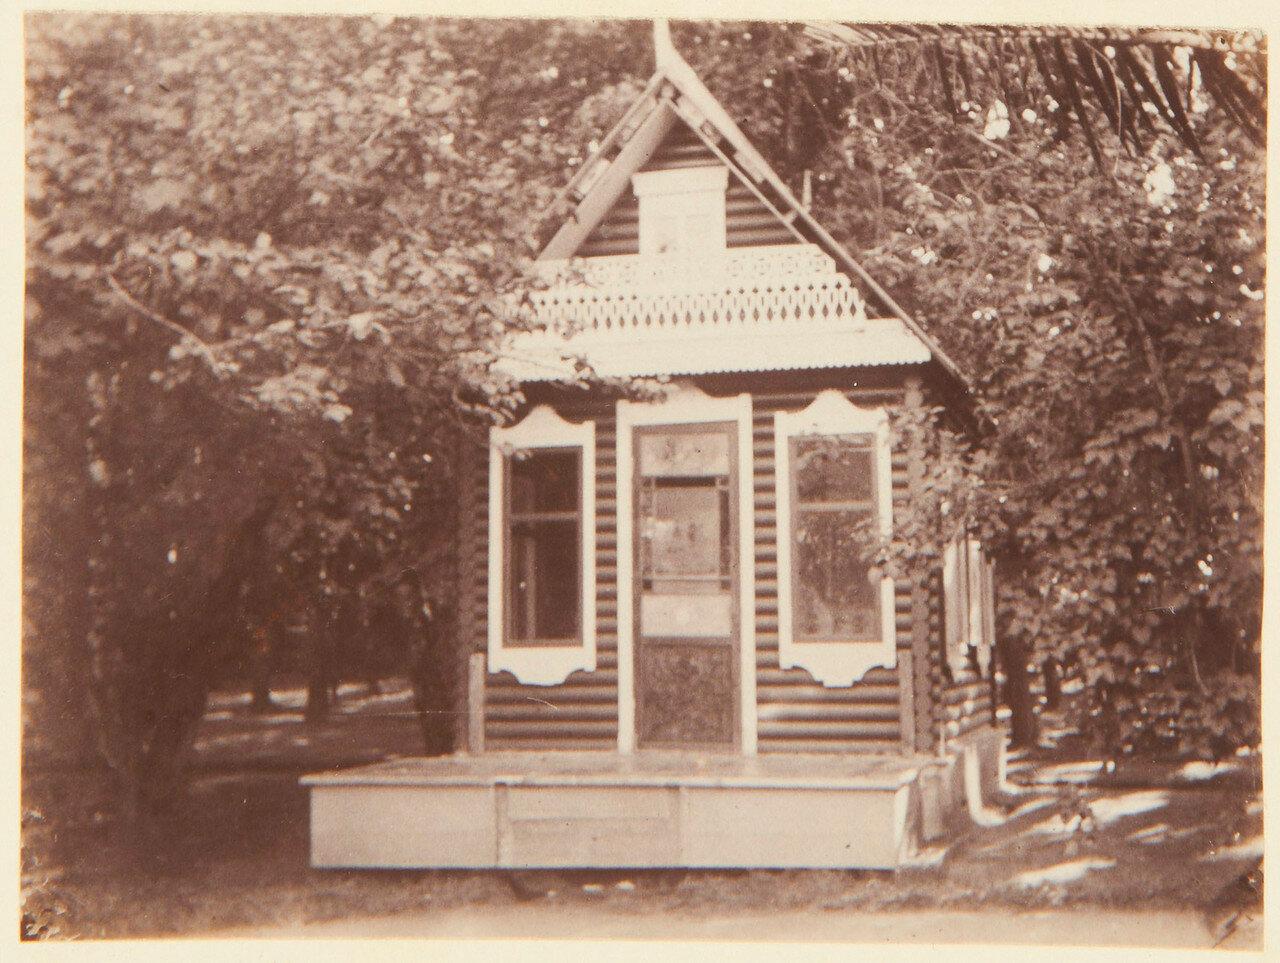 39. Веранда Фермерского дворца со статуей единорога